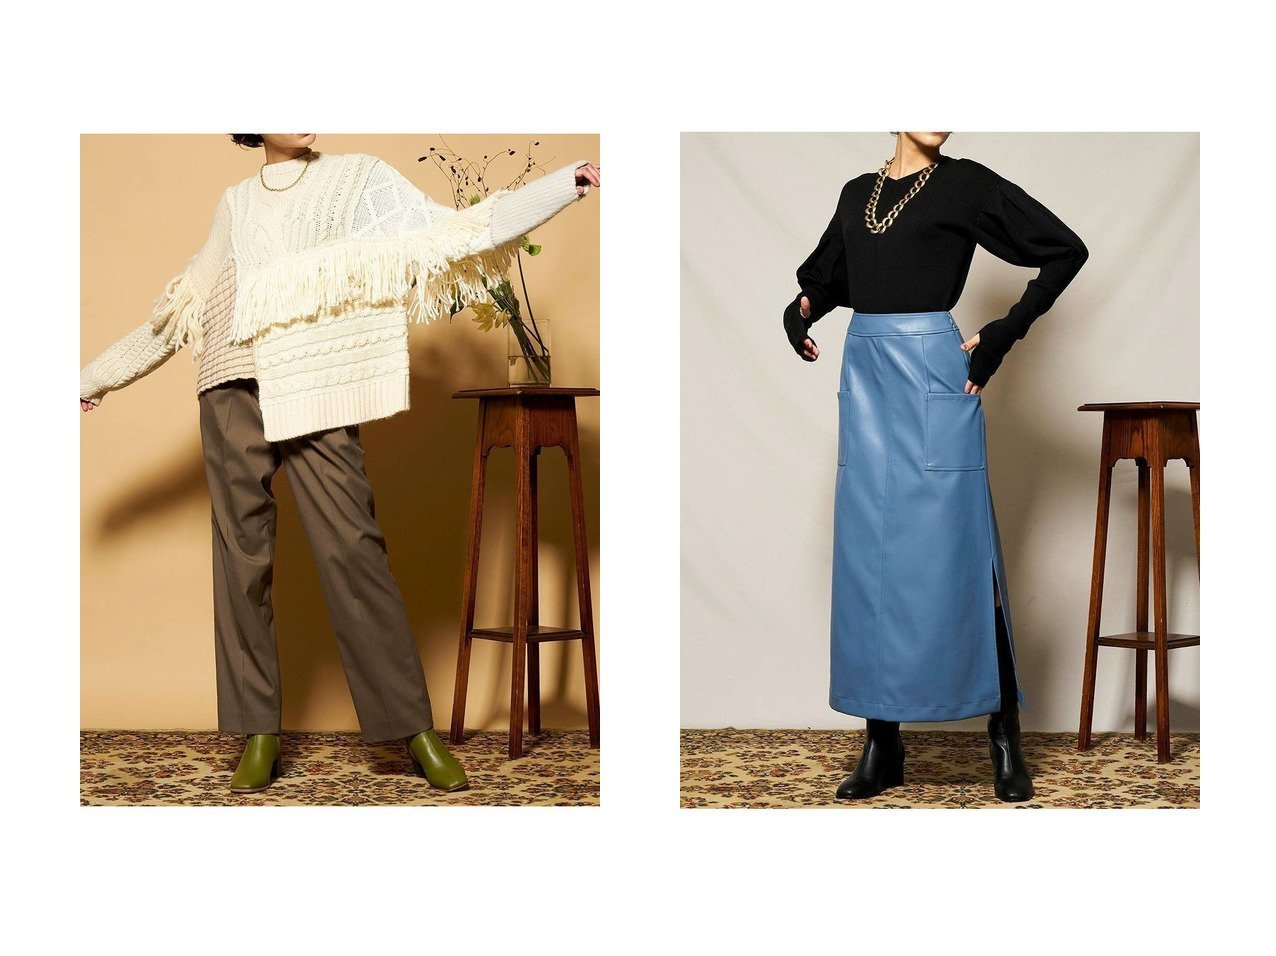 【MAISON SPECIAL/メゾンスペシャル】のフリンジケーブルニットプルオーバー&パフスリーブ2WAYニット トップス・カットソーのおすすめ!人気、レディースファッションの通販 おすすめで人気のファッション通販商品 インテリア・家具・キッズファッション・メンズファッション・レディースファッション・服の通販 founy(ファニー) https://founy.com/ ファッション Fashion レディース WOMEN トップス Tops Tshirt ニット Knit Tops プルオーバー Pullover アシンメトリー パッチワーク フリンジ 秋冬 A/W Autumn/ Winter スリーブ |ID:crp329100000001943